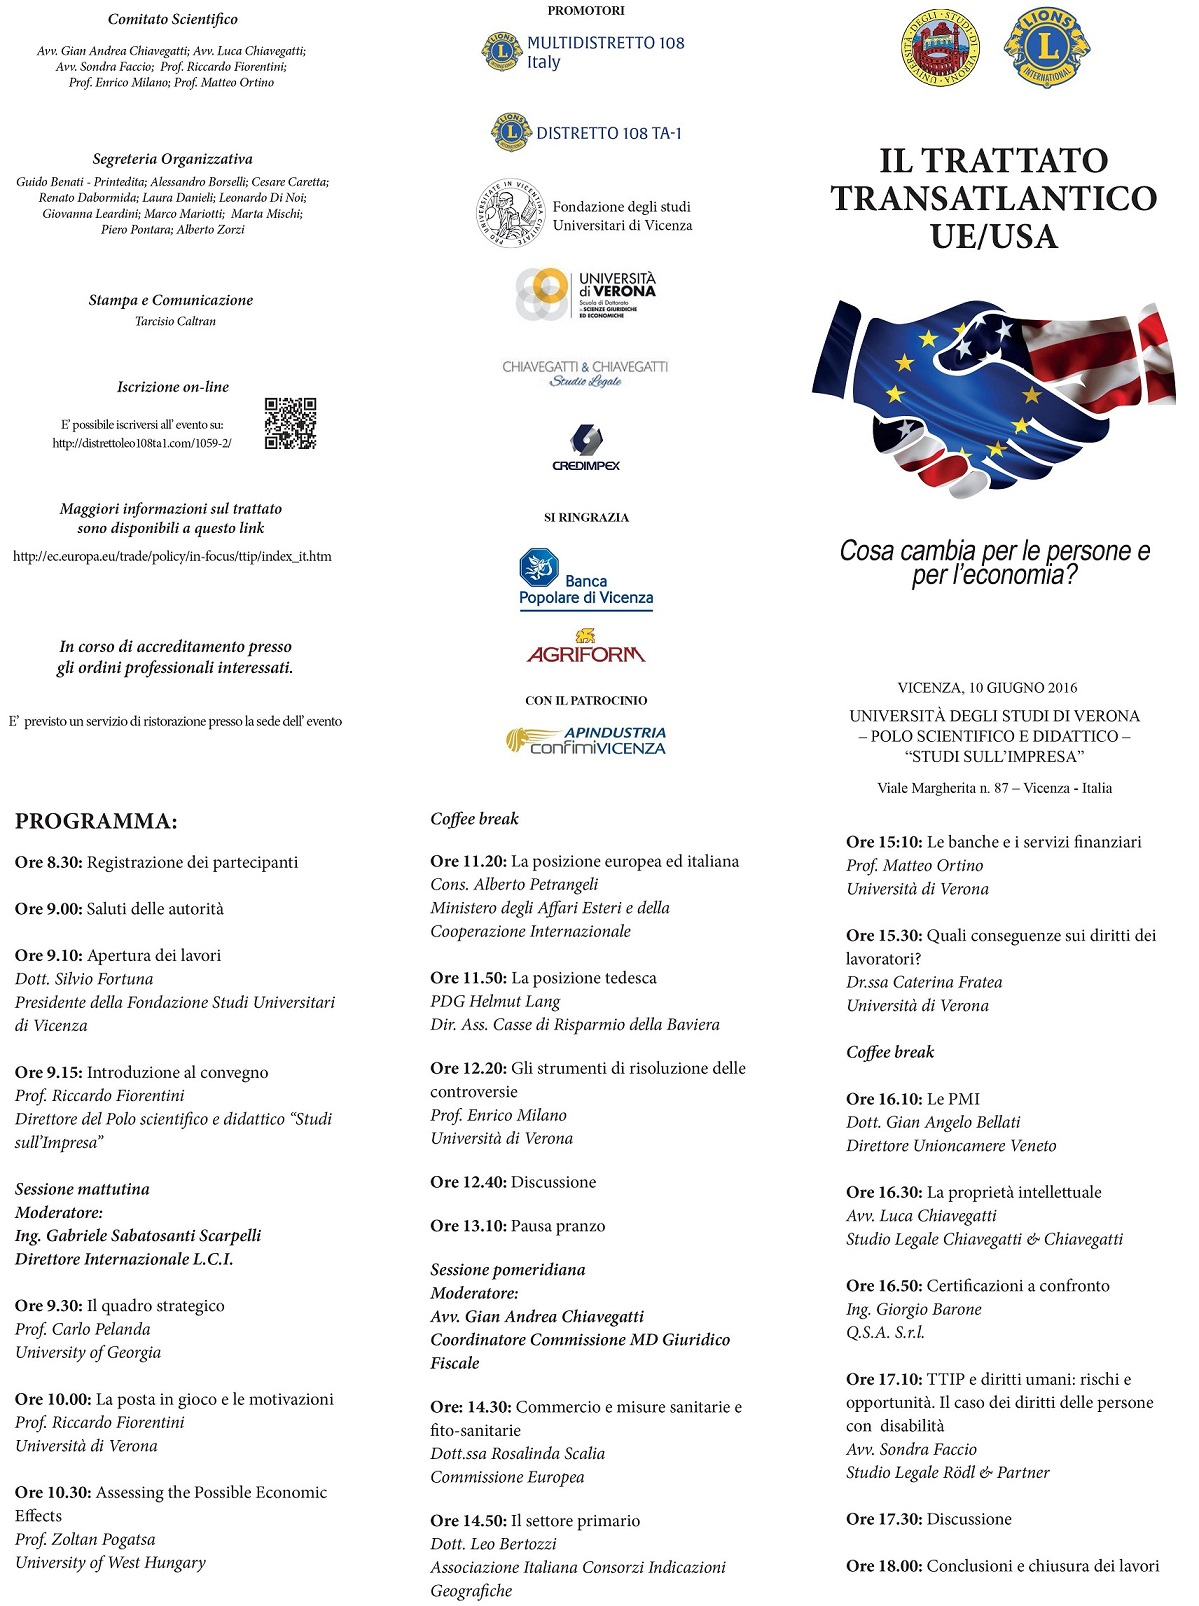 2016-05-30 PROGRAMMA TTIP